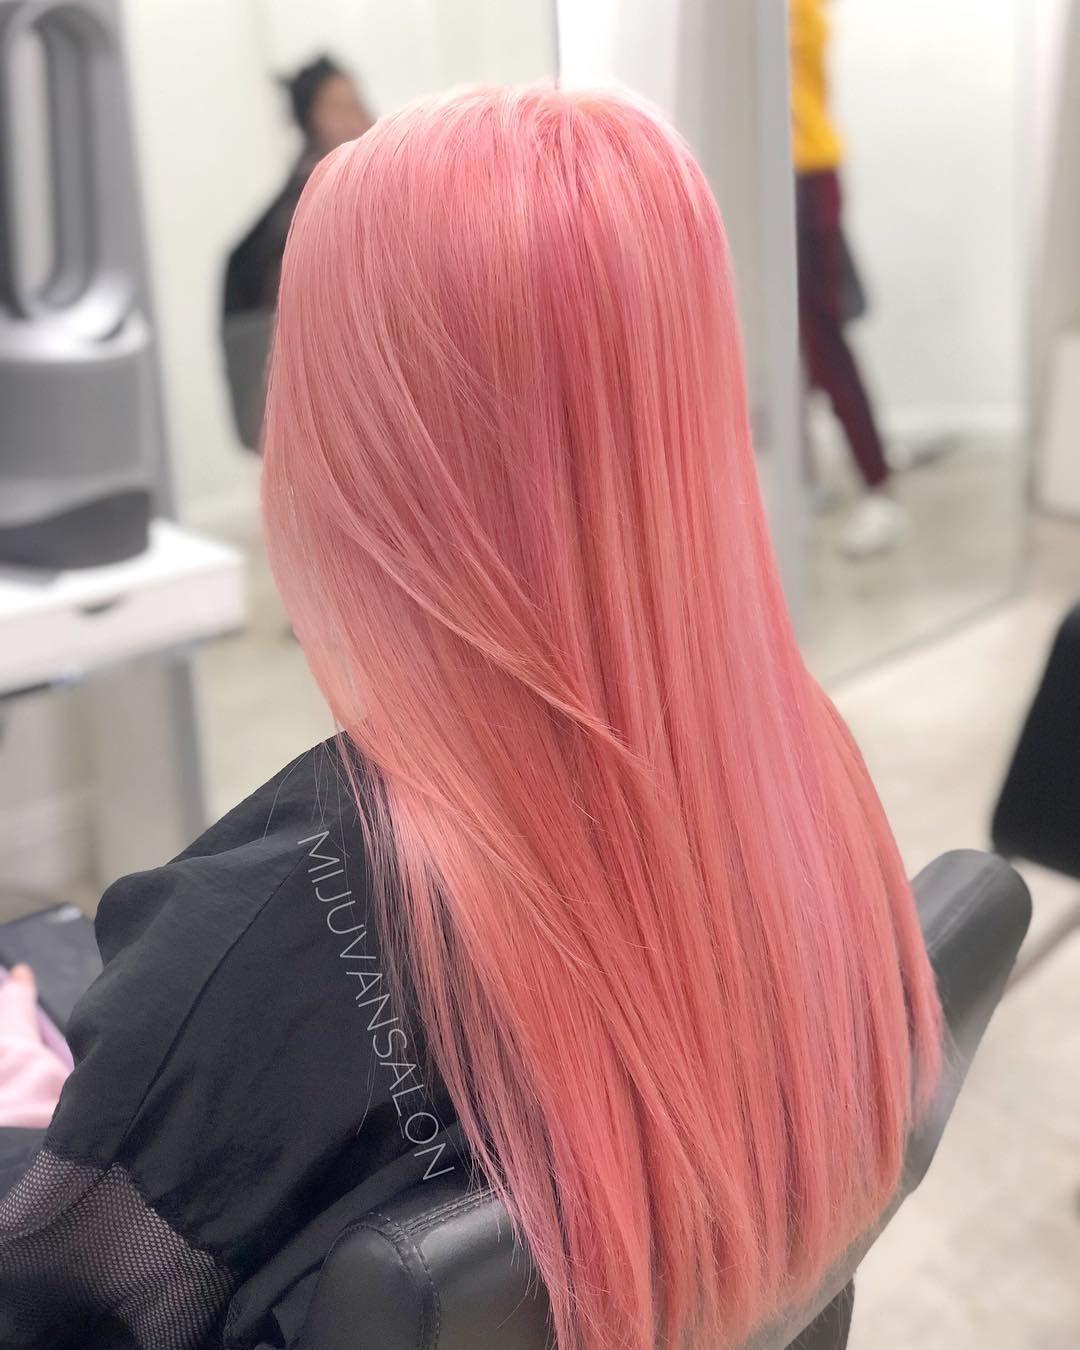 Hairstyles Panosundaki Pin